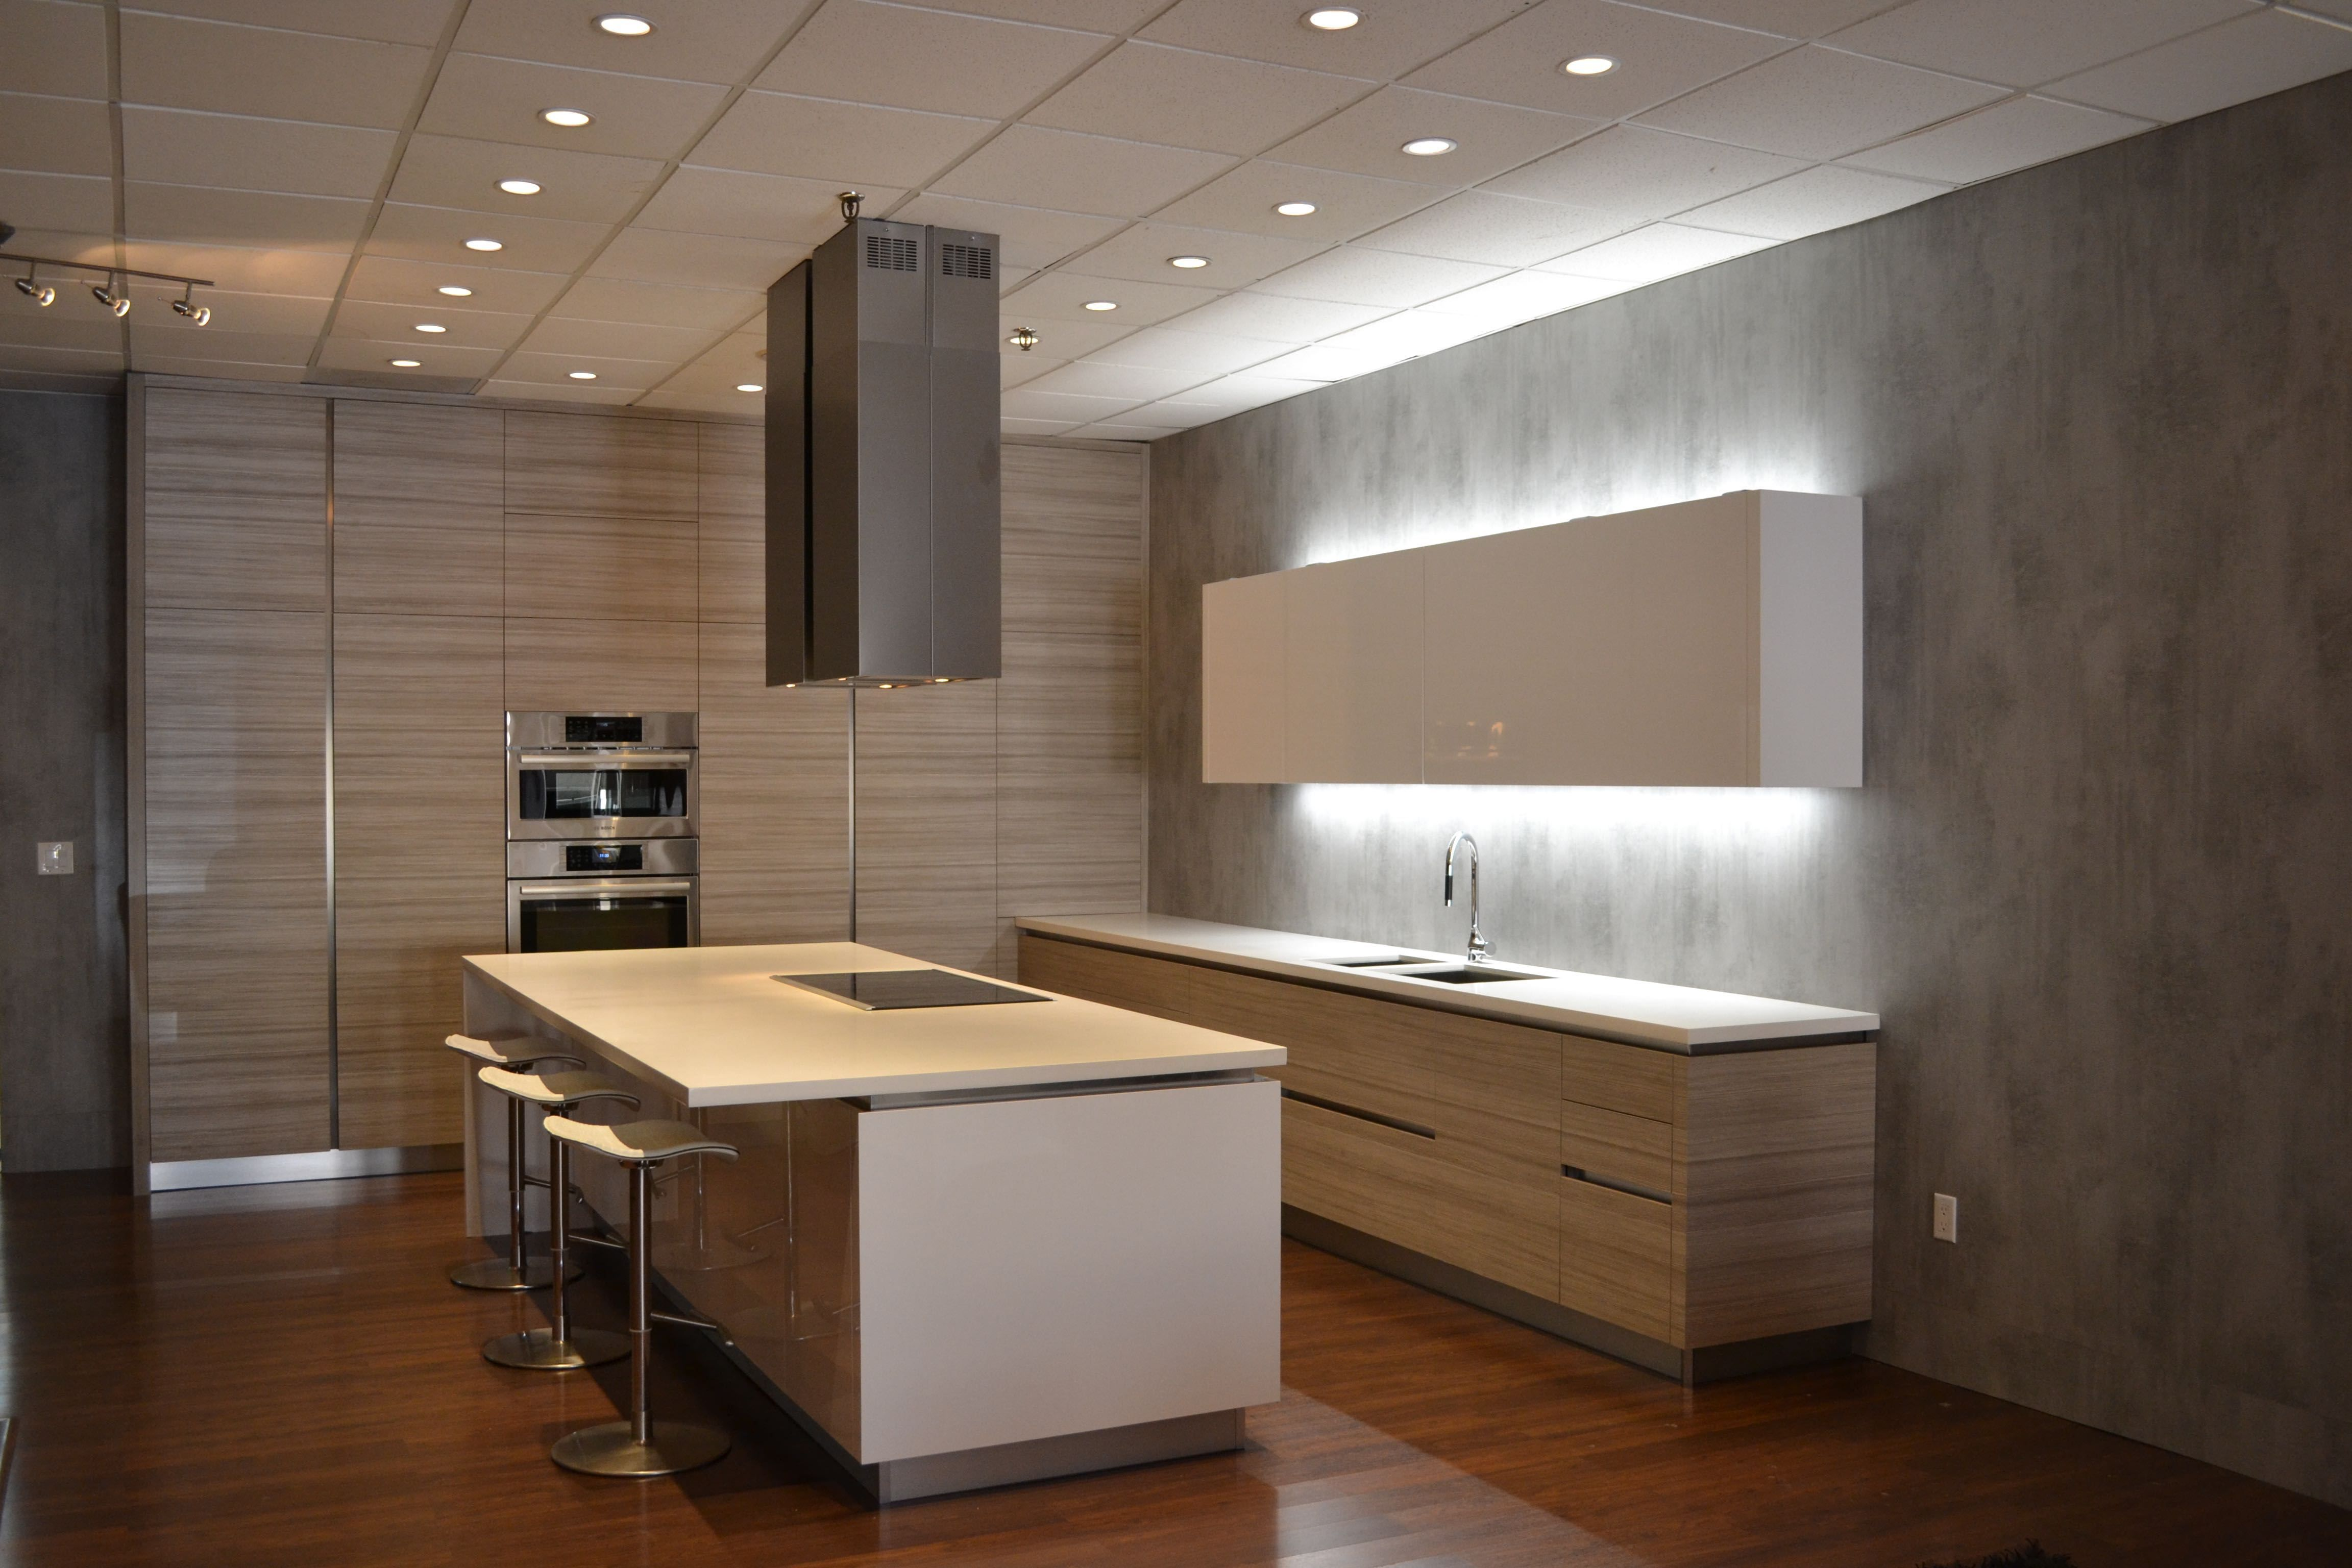 Textured Laminate Kitchen Cabinet Doors Allstyle Laminate Kitchen Cabinet